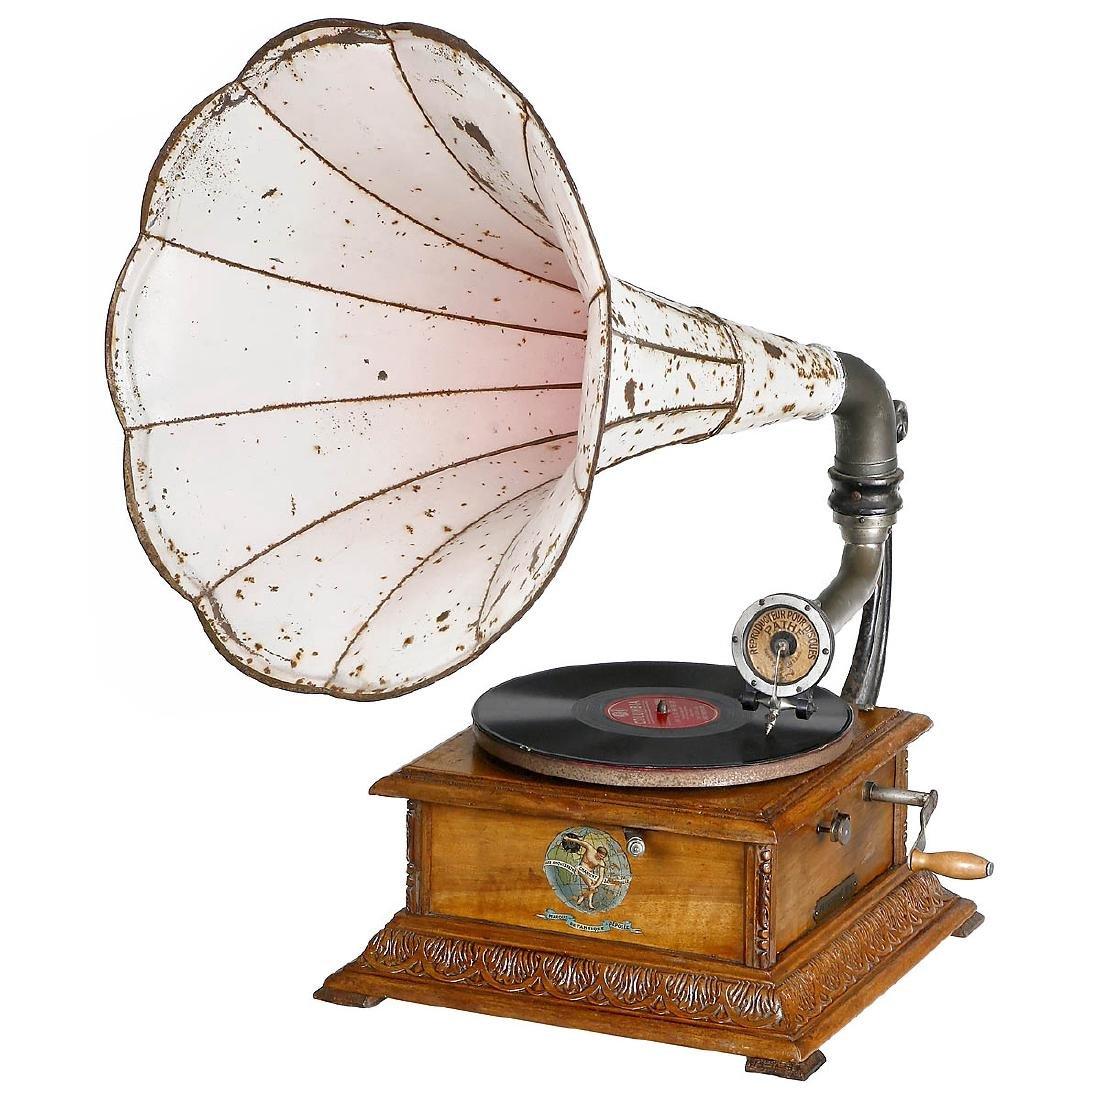 Pathéphone No. 4 Horn Gramophone